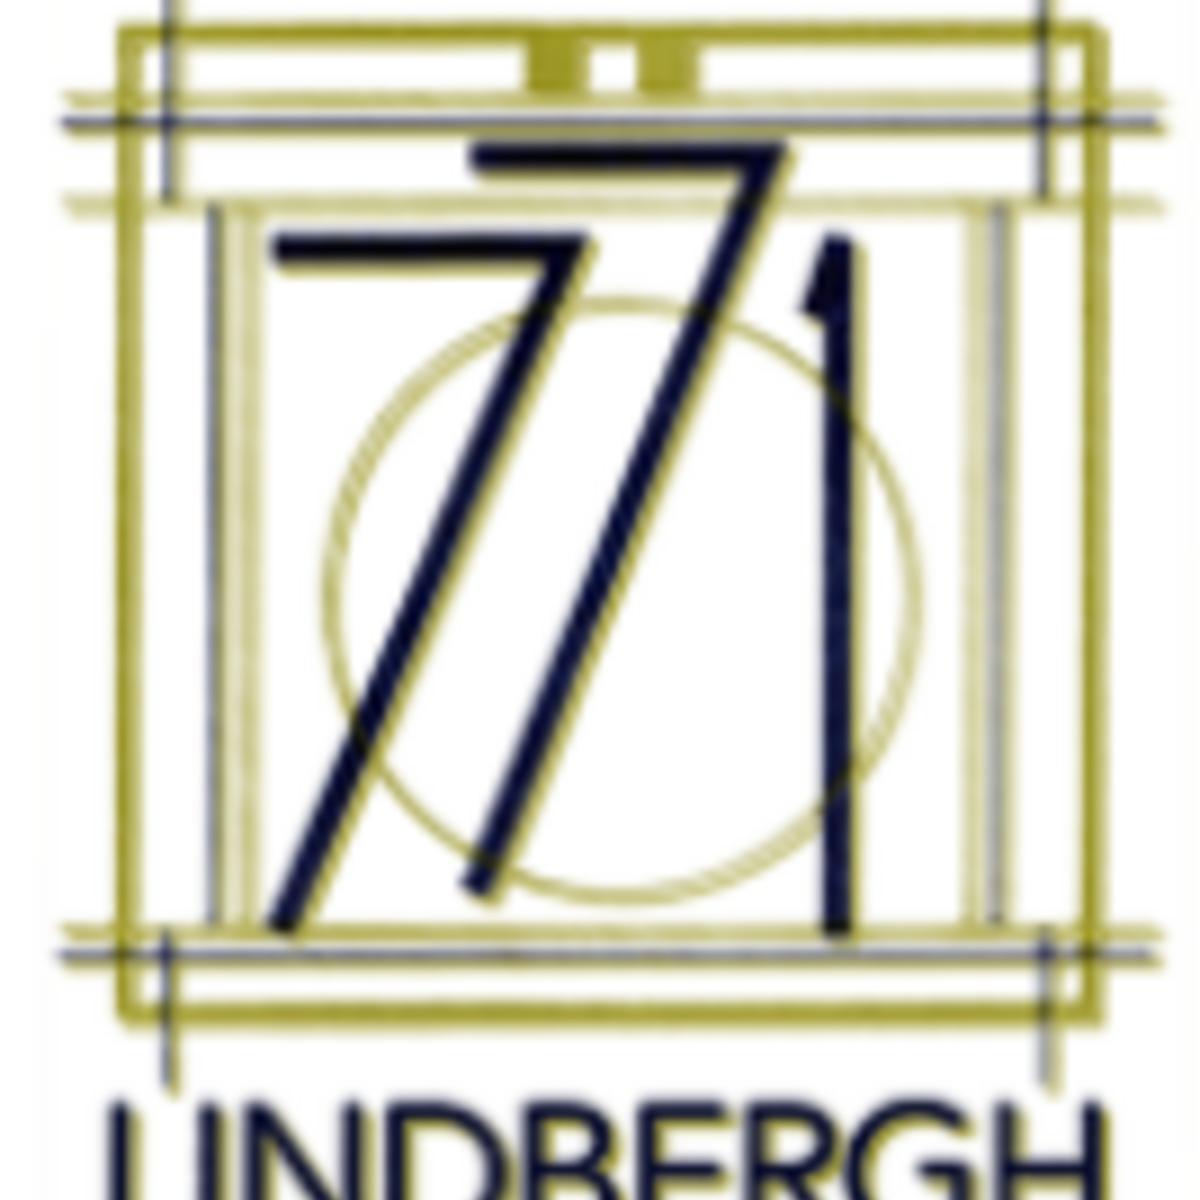 771 Lindbergh Apartment Homes